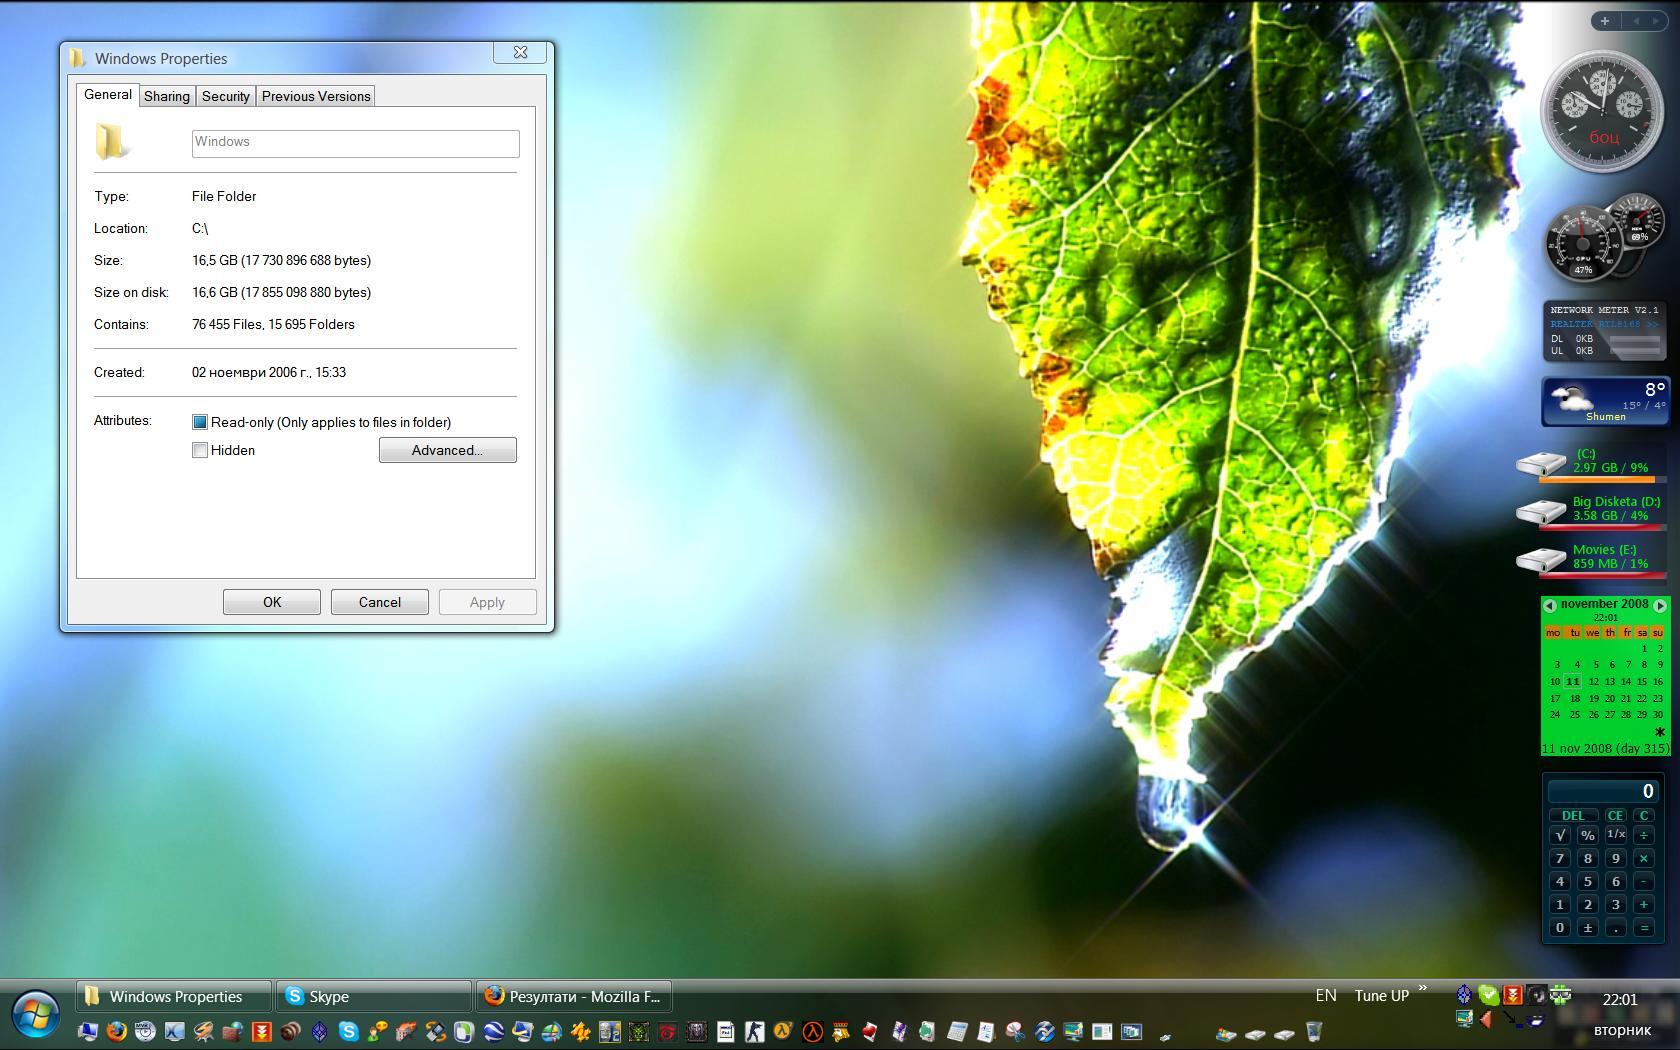 desktop 11 11 2008